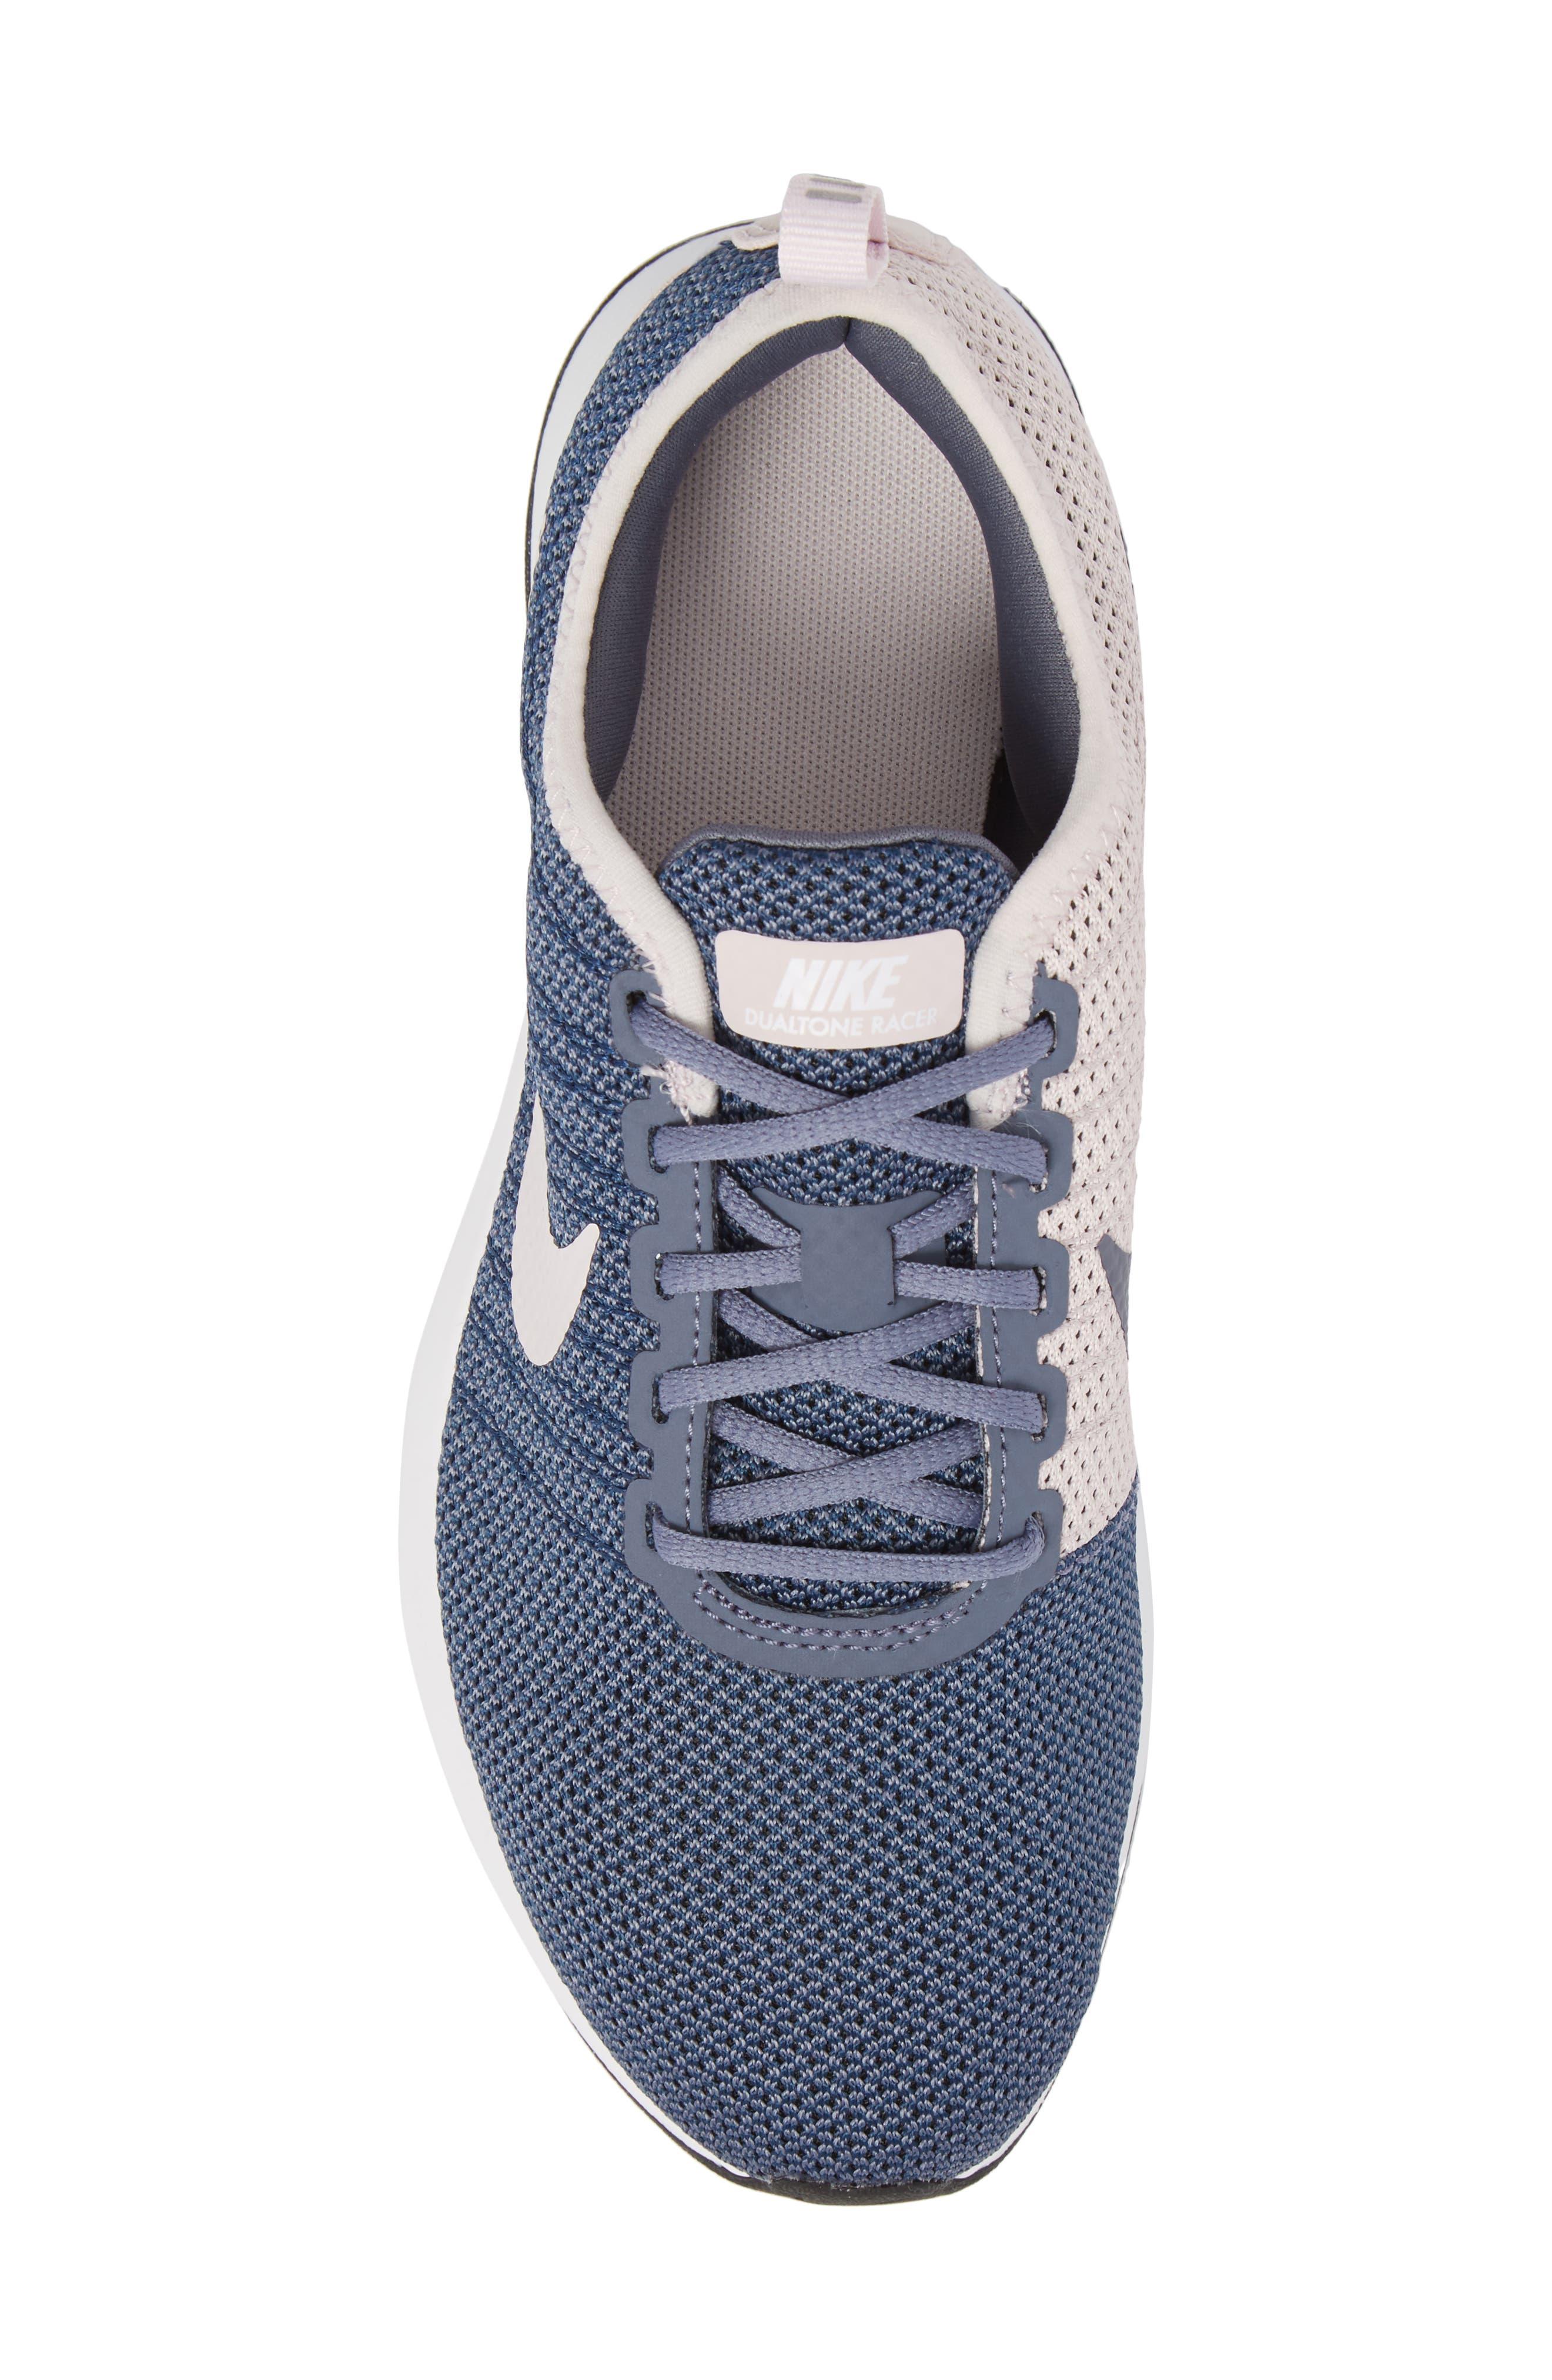 Dualtone Racer GS Sneaker,                             Alternate thumbnail 5, color,                             020